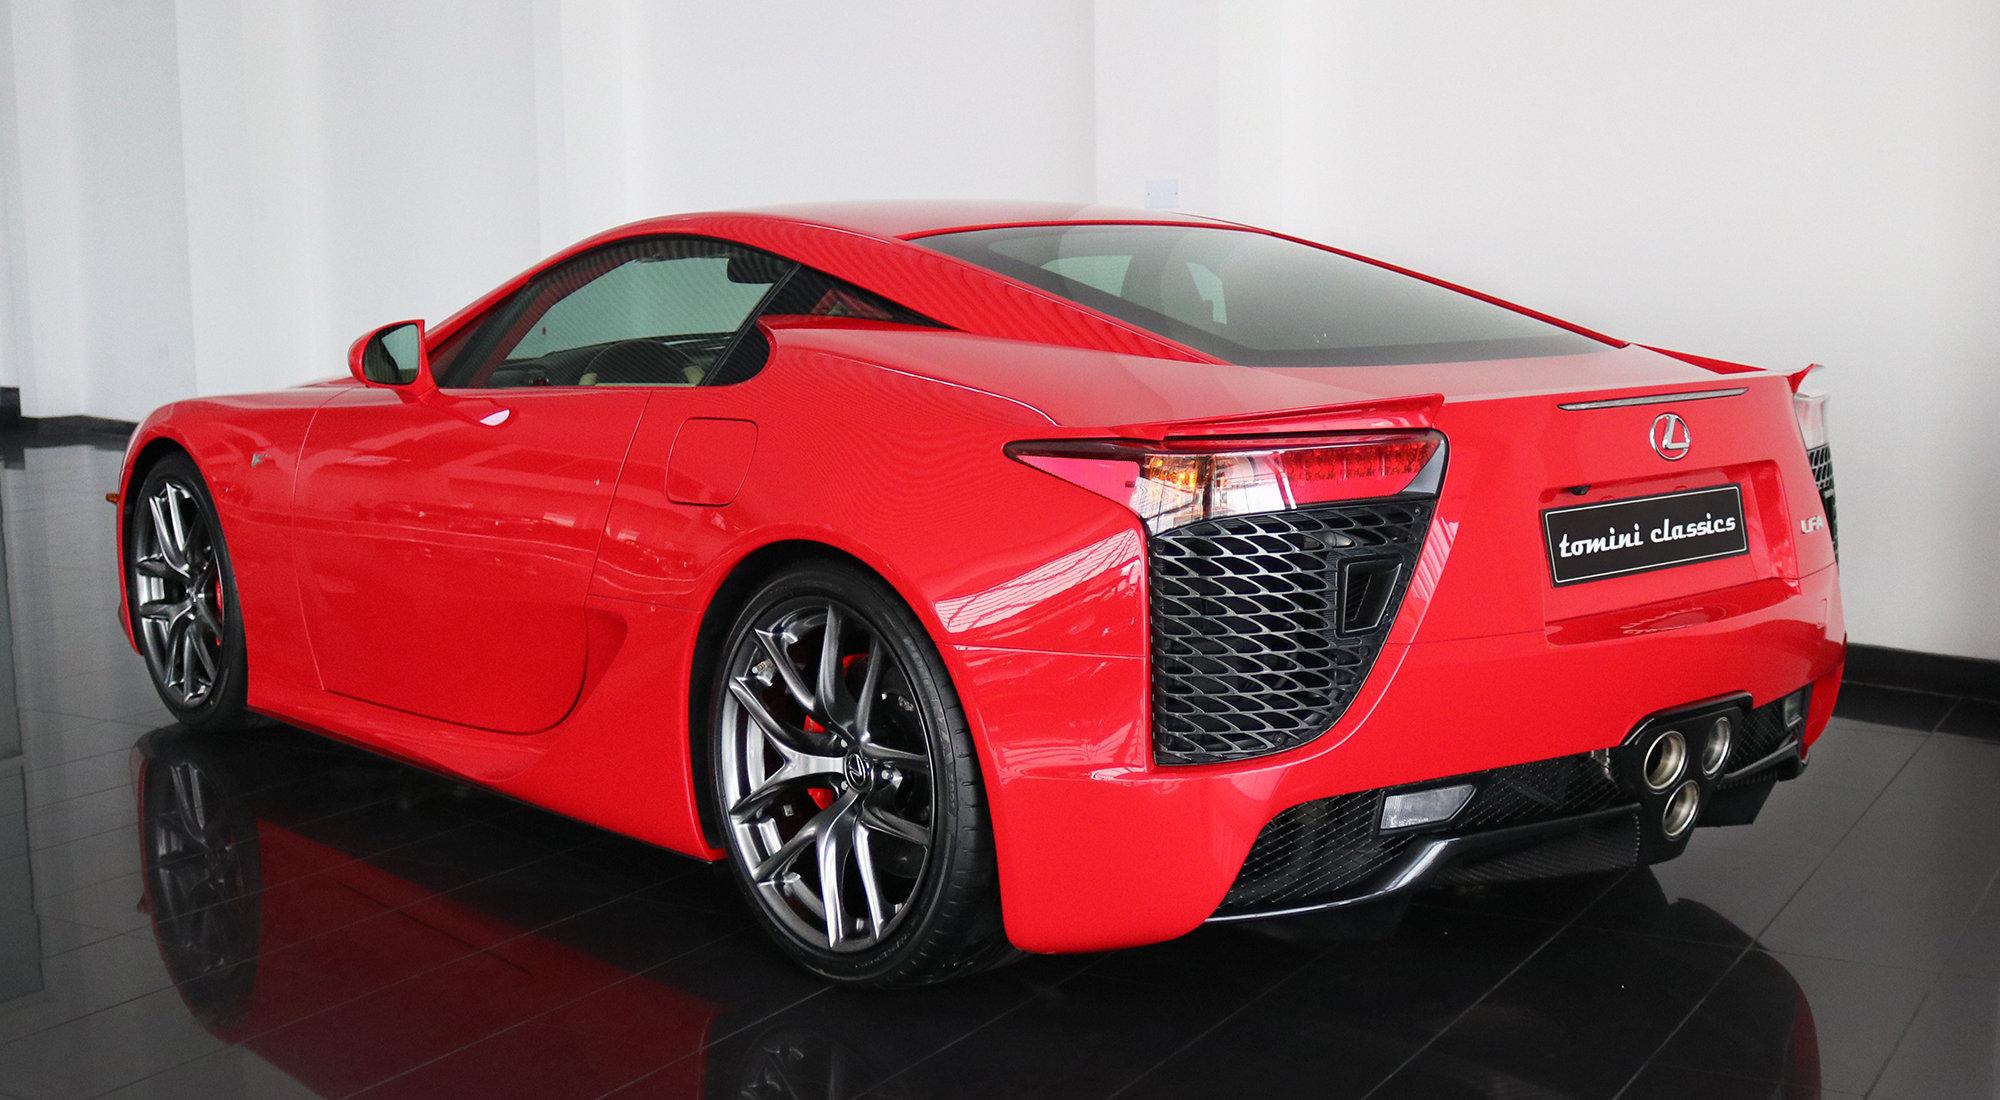 Lexus LFA (2012) For Sale (picture 3 of 6)